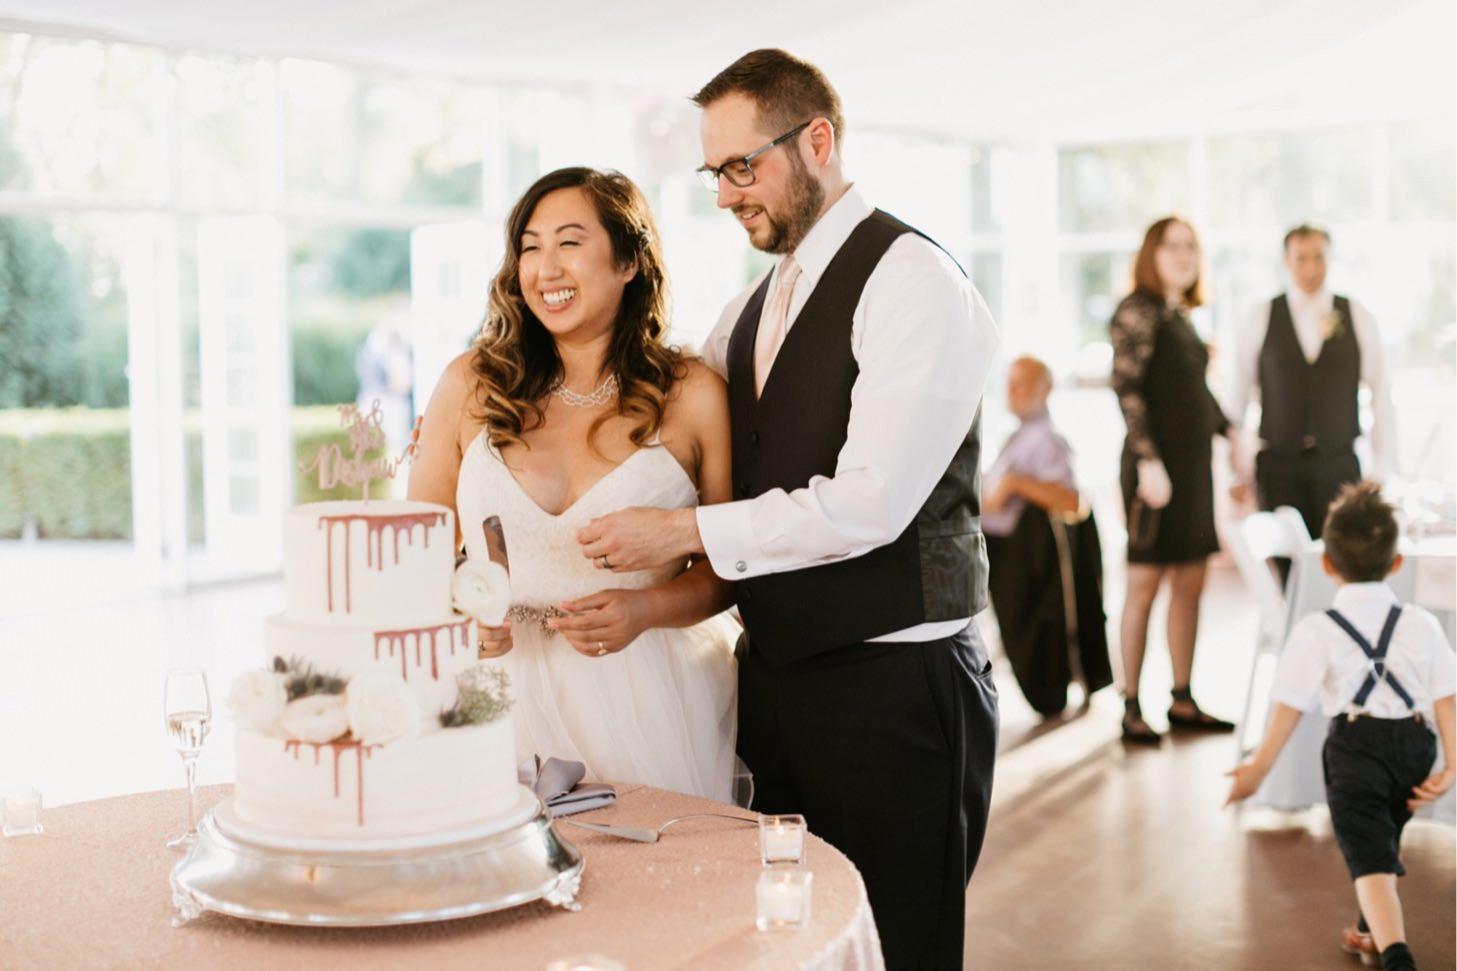 ritz-charles-wedding-reception-downtown-indianapolis-wedding-photographer031.JPG